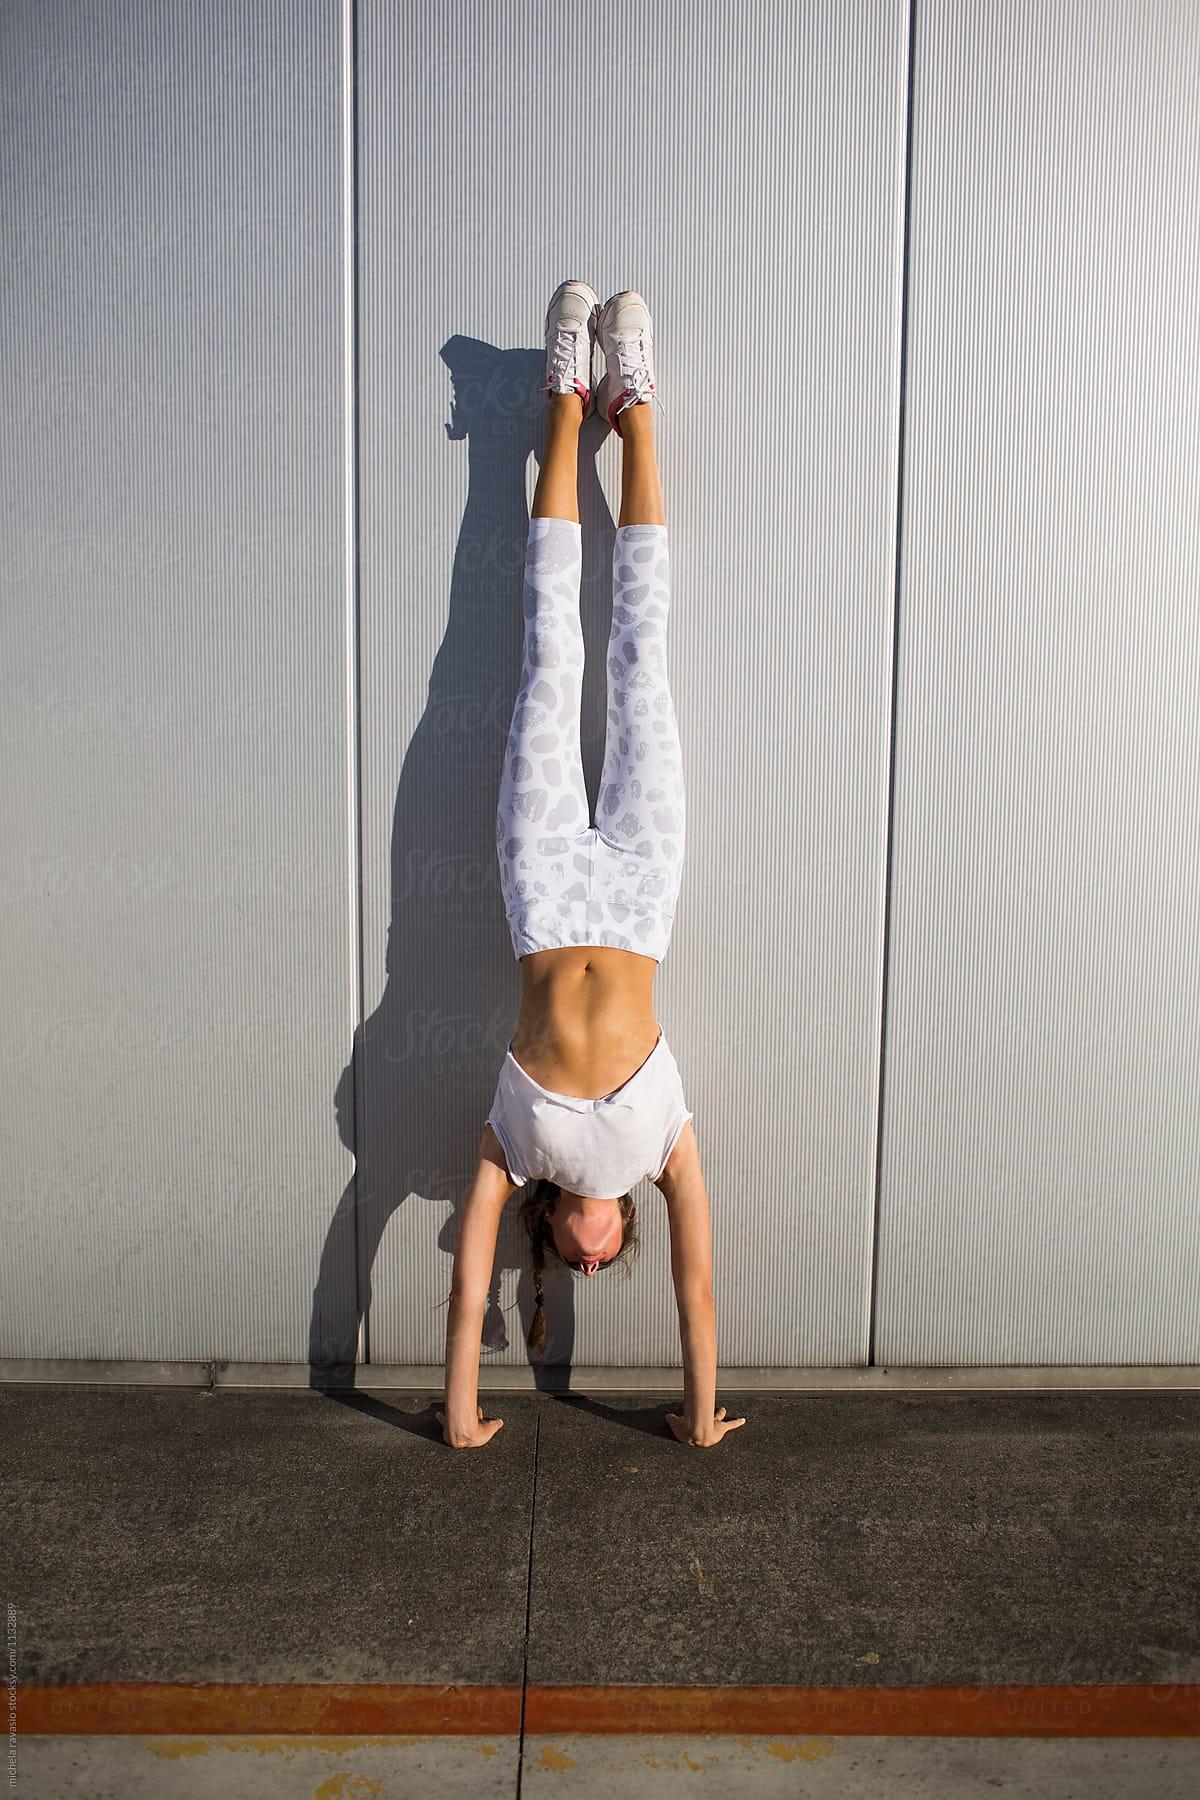 Girl doing handstand by michela ravasio - Stocksy United